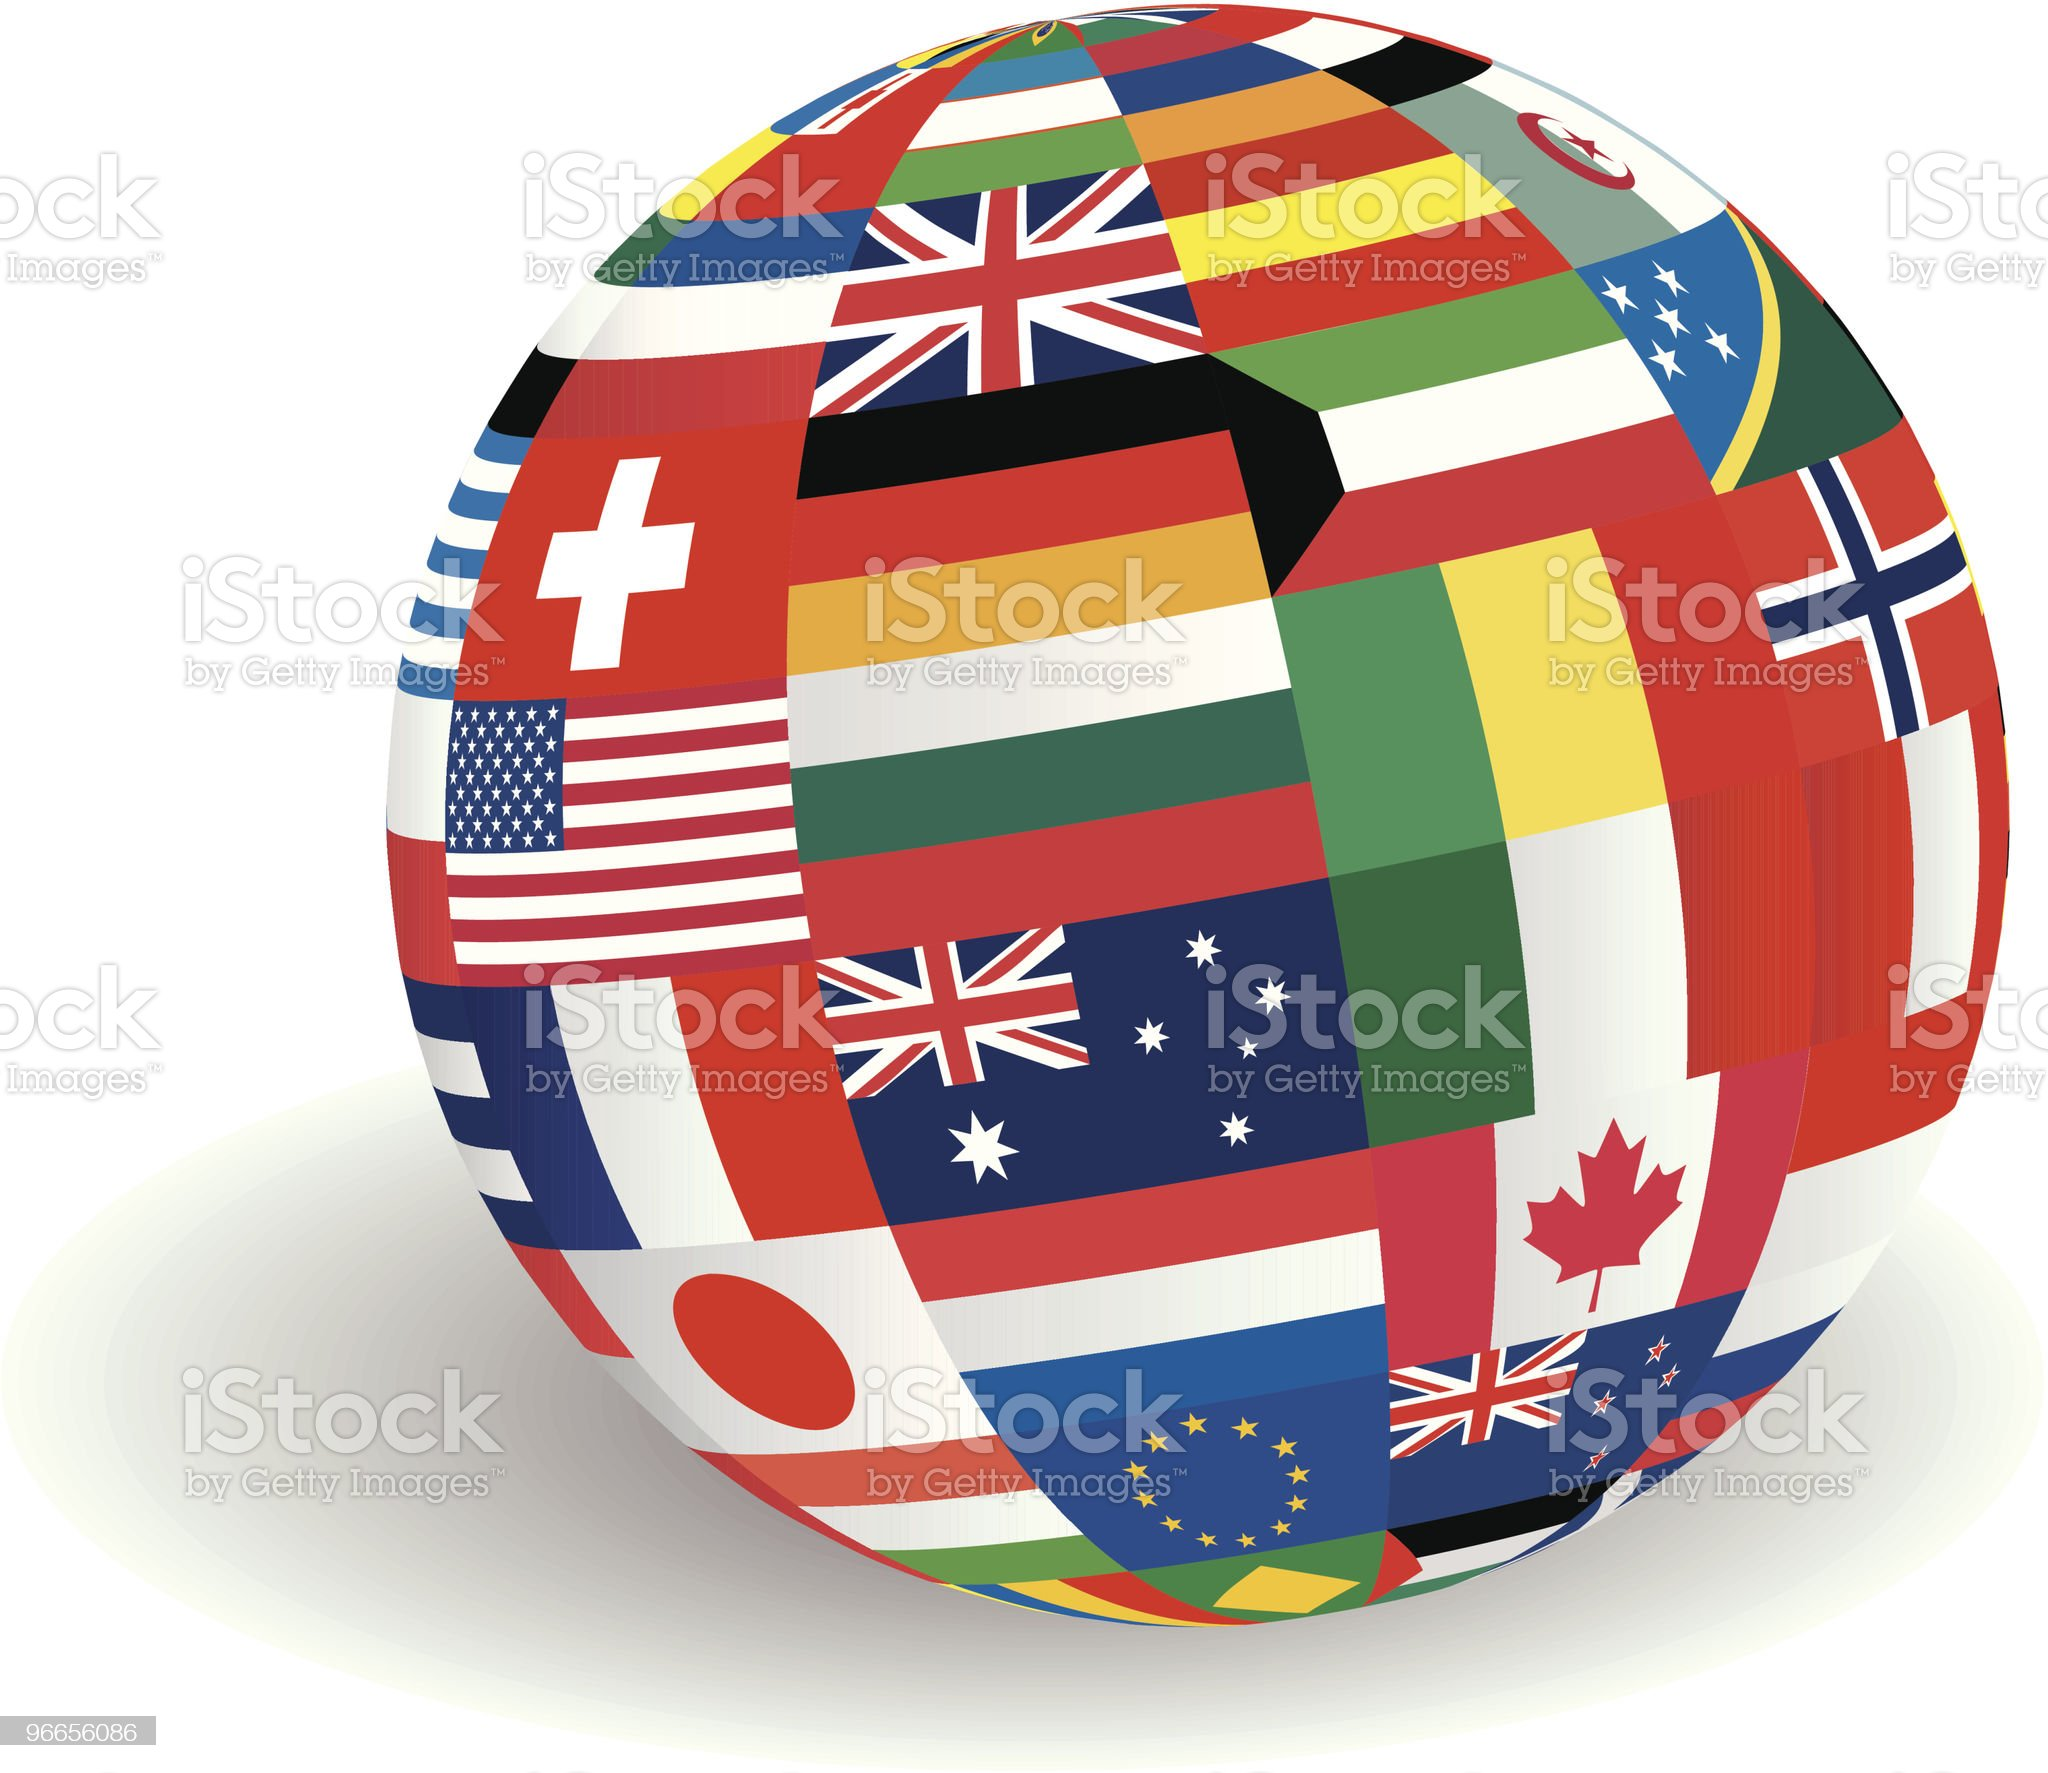 Globe of world flags royalty-free stock vector art